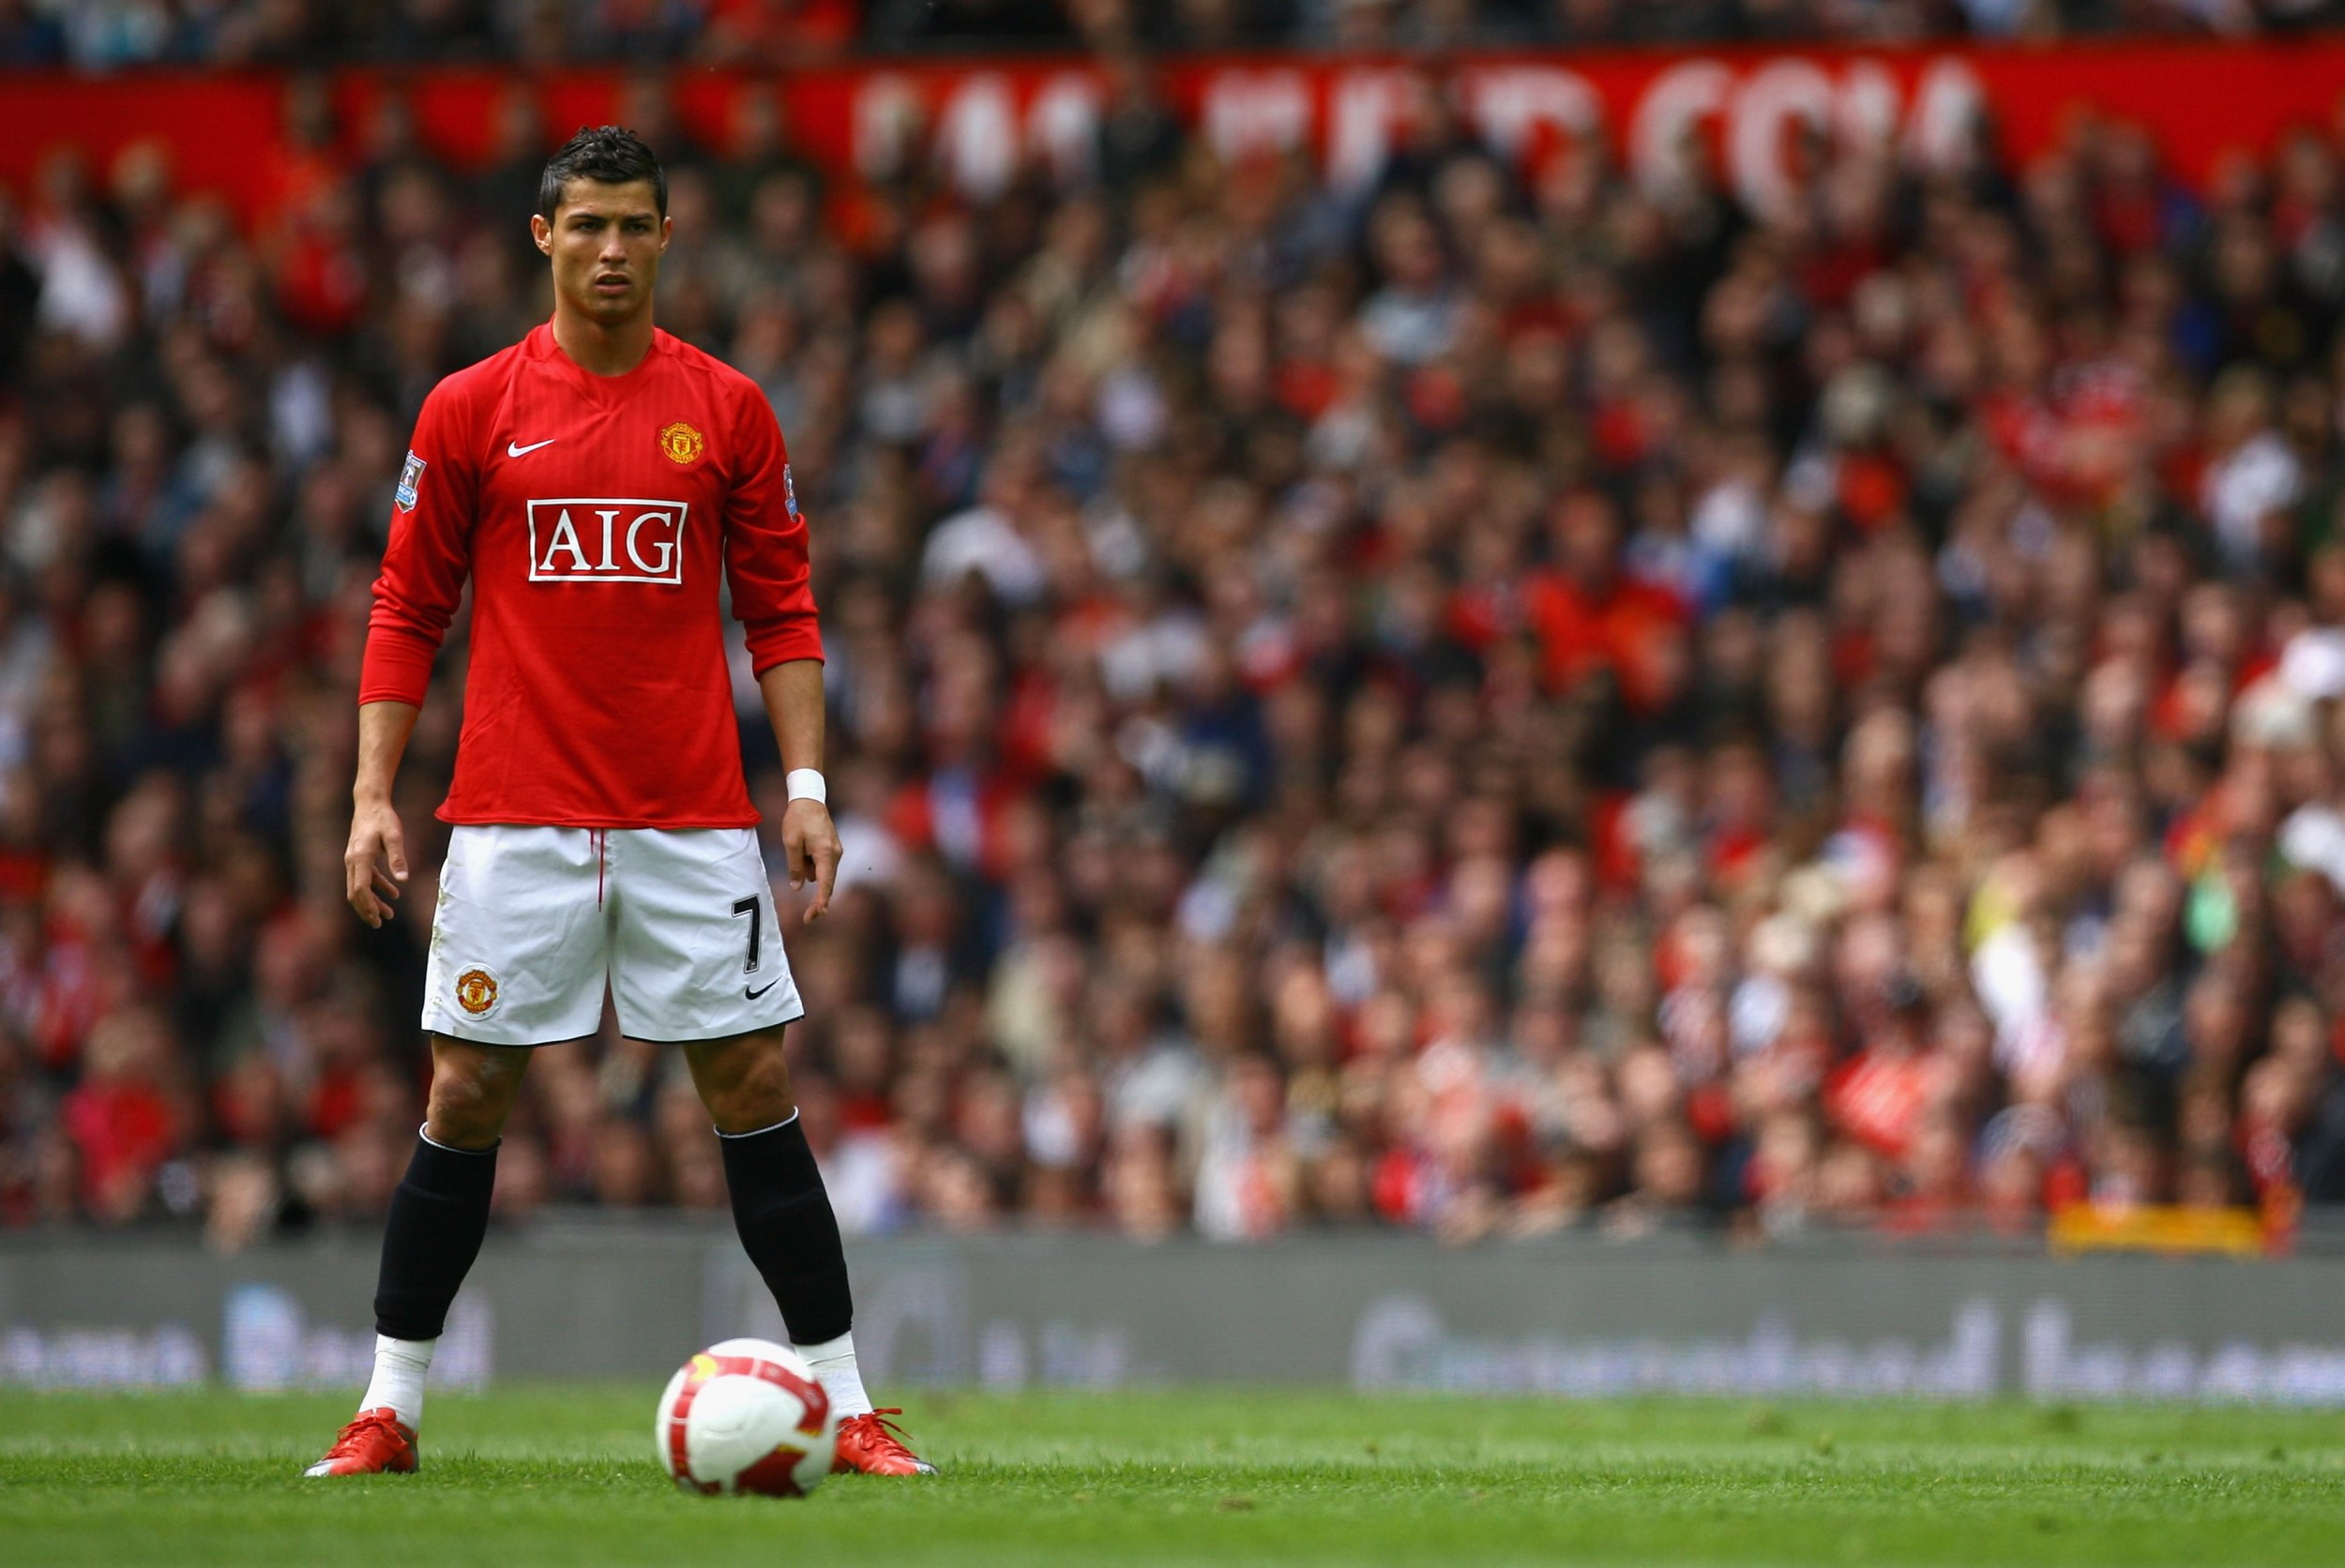 Cristiano Ronaldo Manchester United S Marcus Rashford Idolized Real Madrid Star